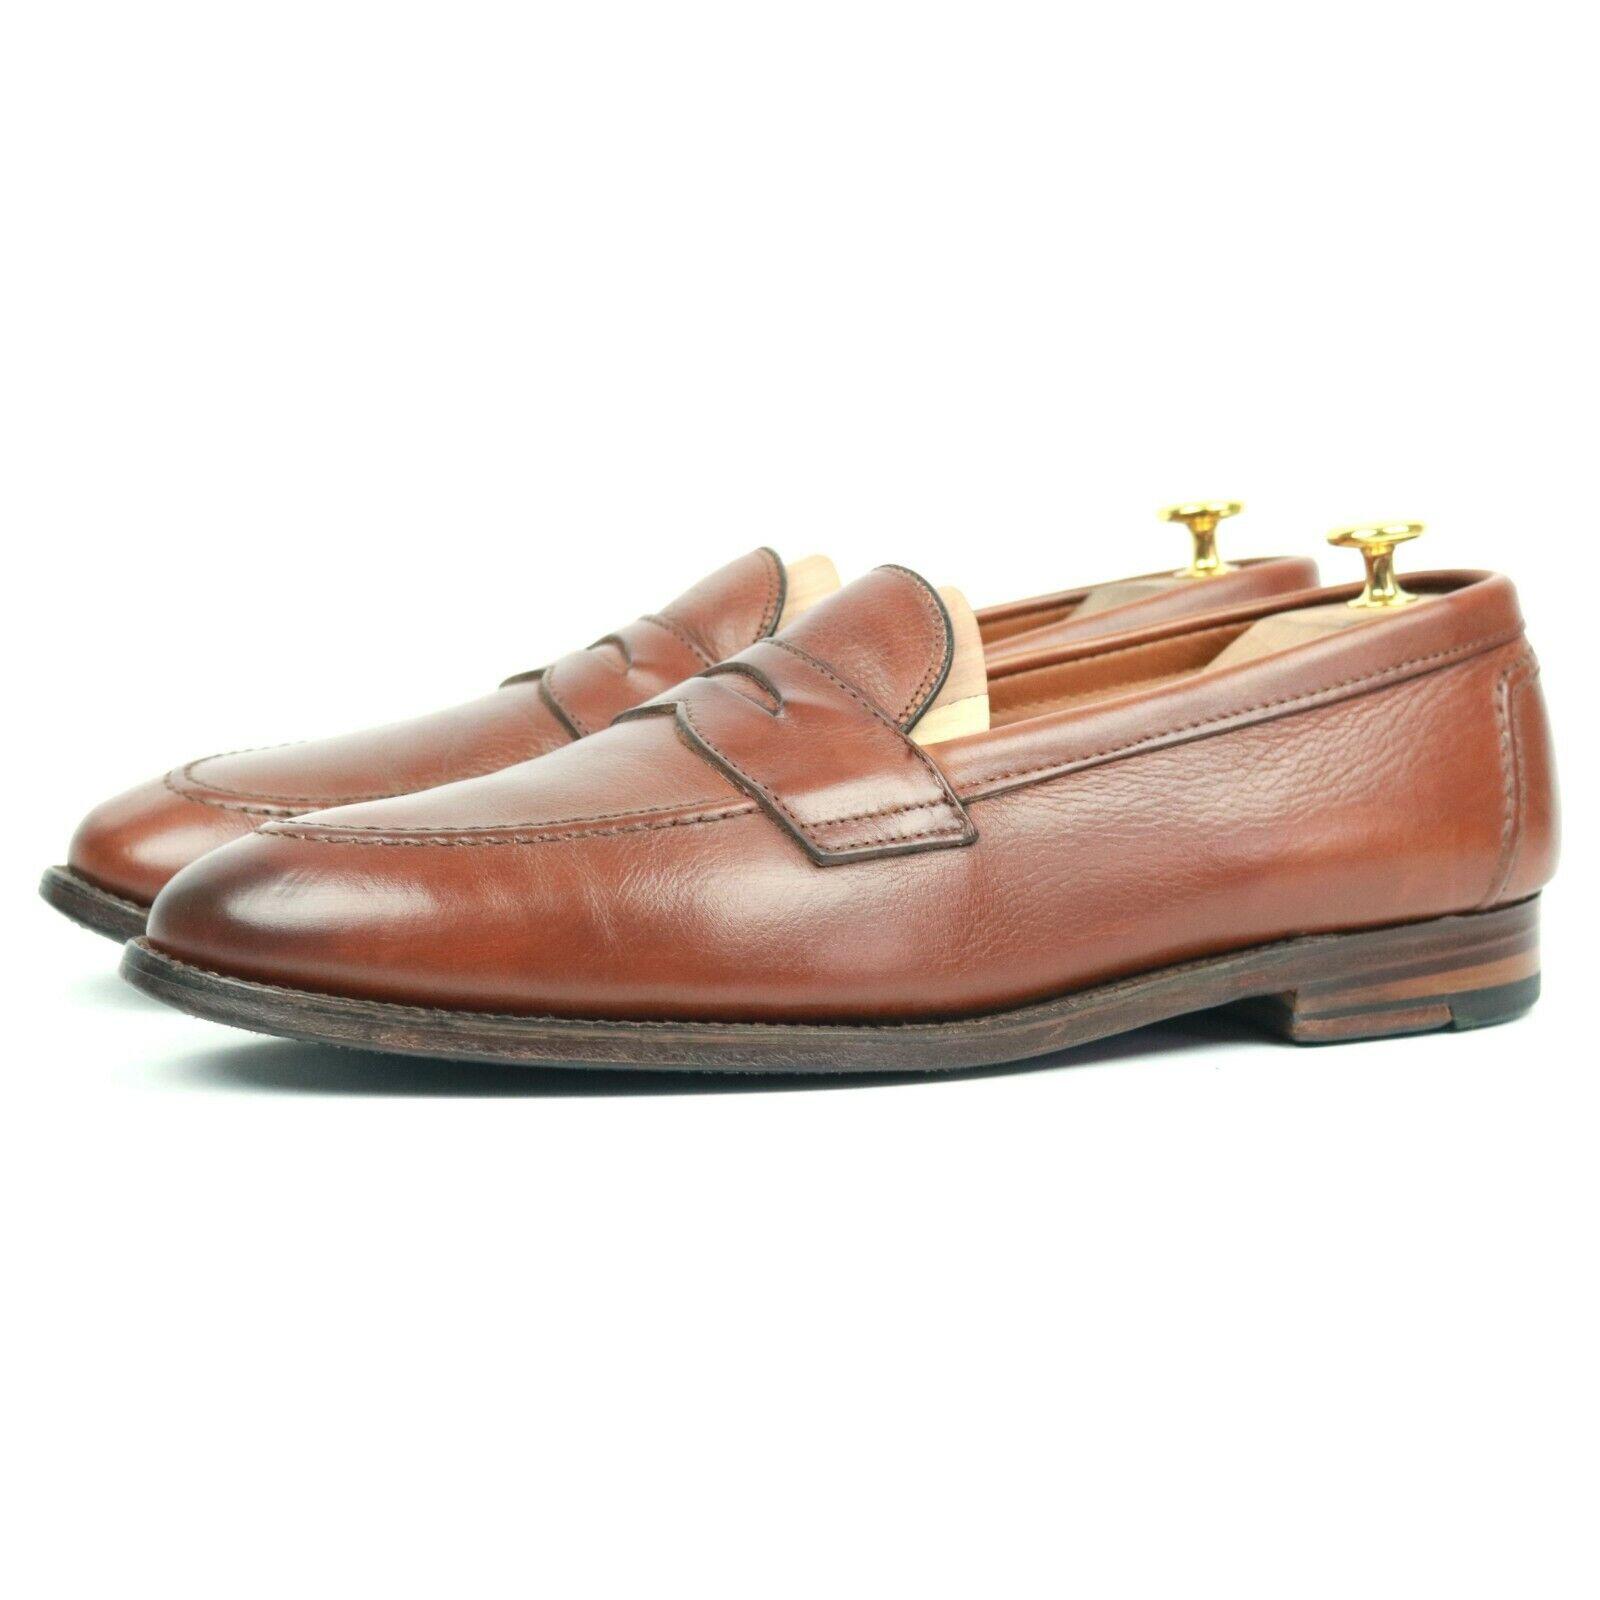 Alden braun Leather Penny Loafers UK 11 US 11.5 EU 45.5